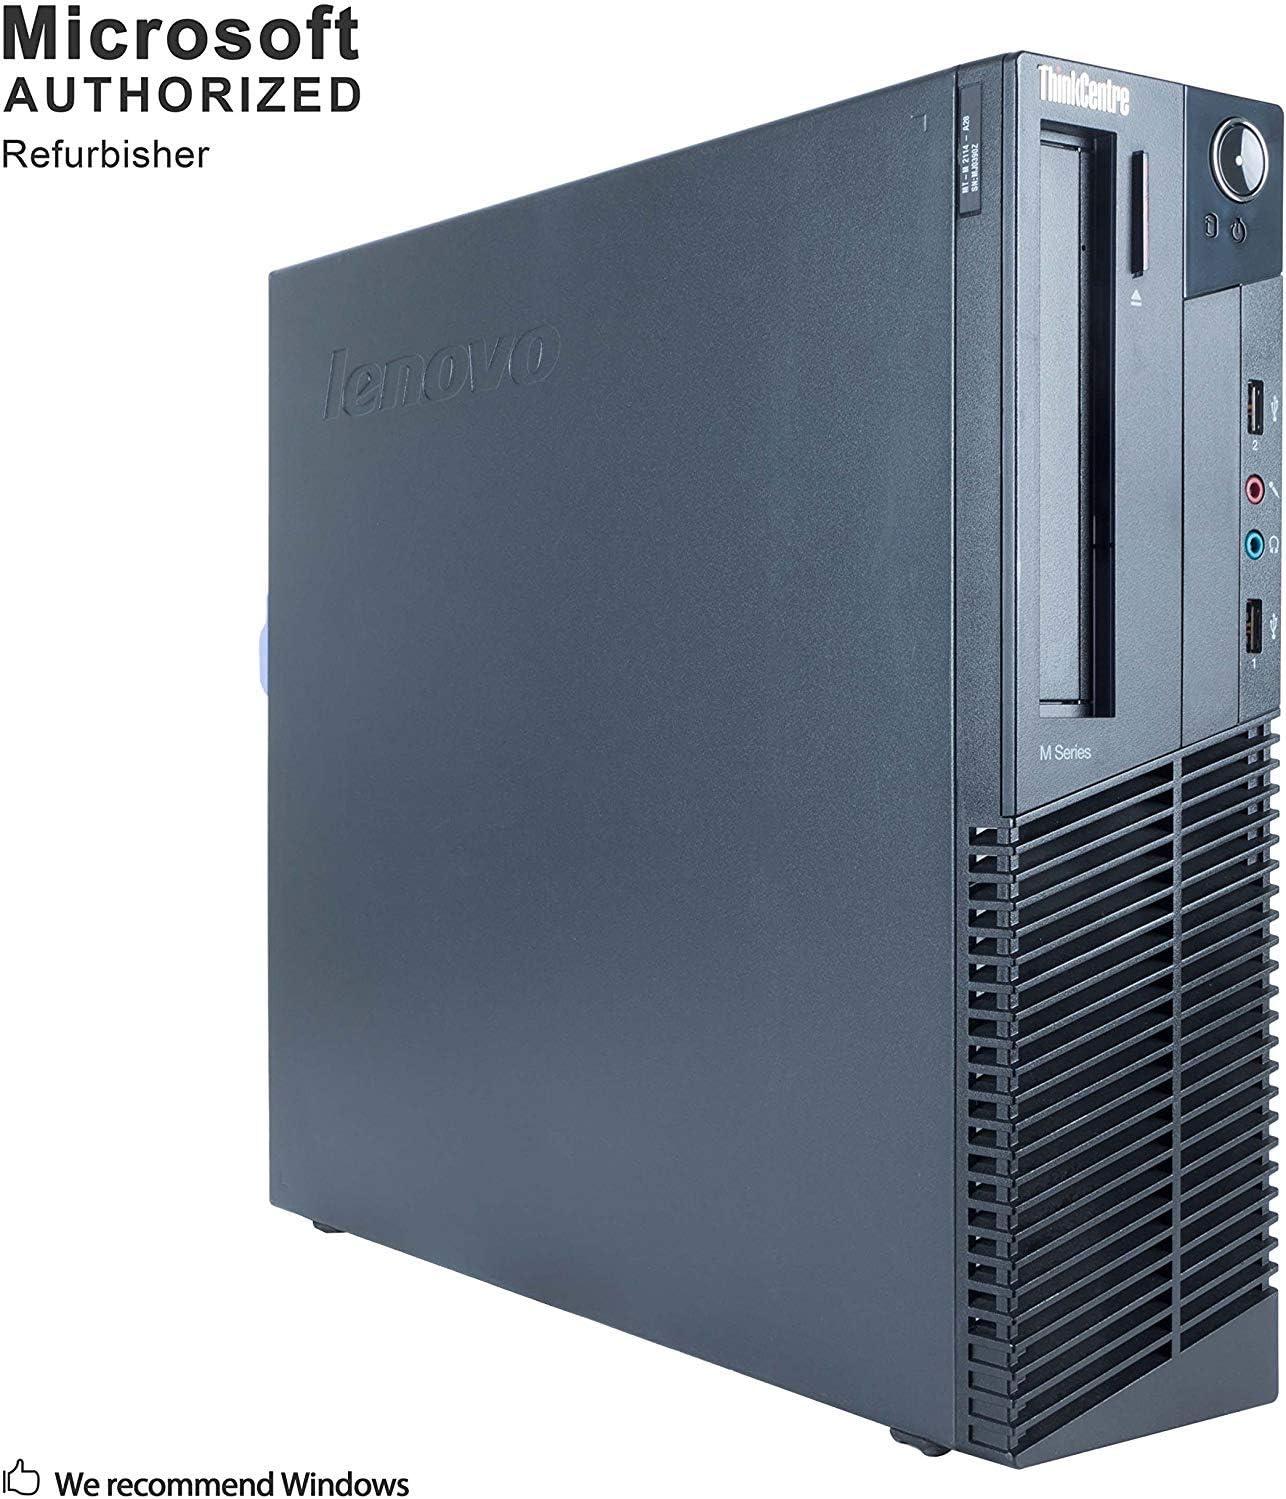 Lenovo ThinkCentre M92p Business Desktop Computer - Intel Core i7 Up to 3.9GHz, 16GB RAM, 480GB SSD, Windows 10 Pro (Renewed)